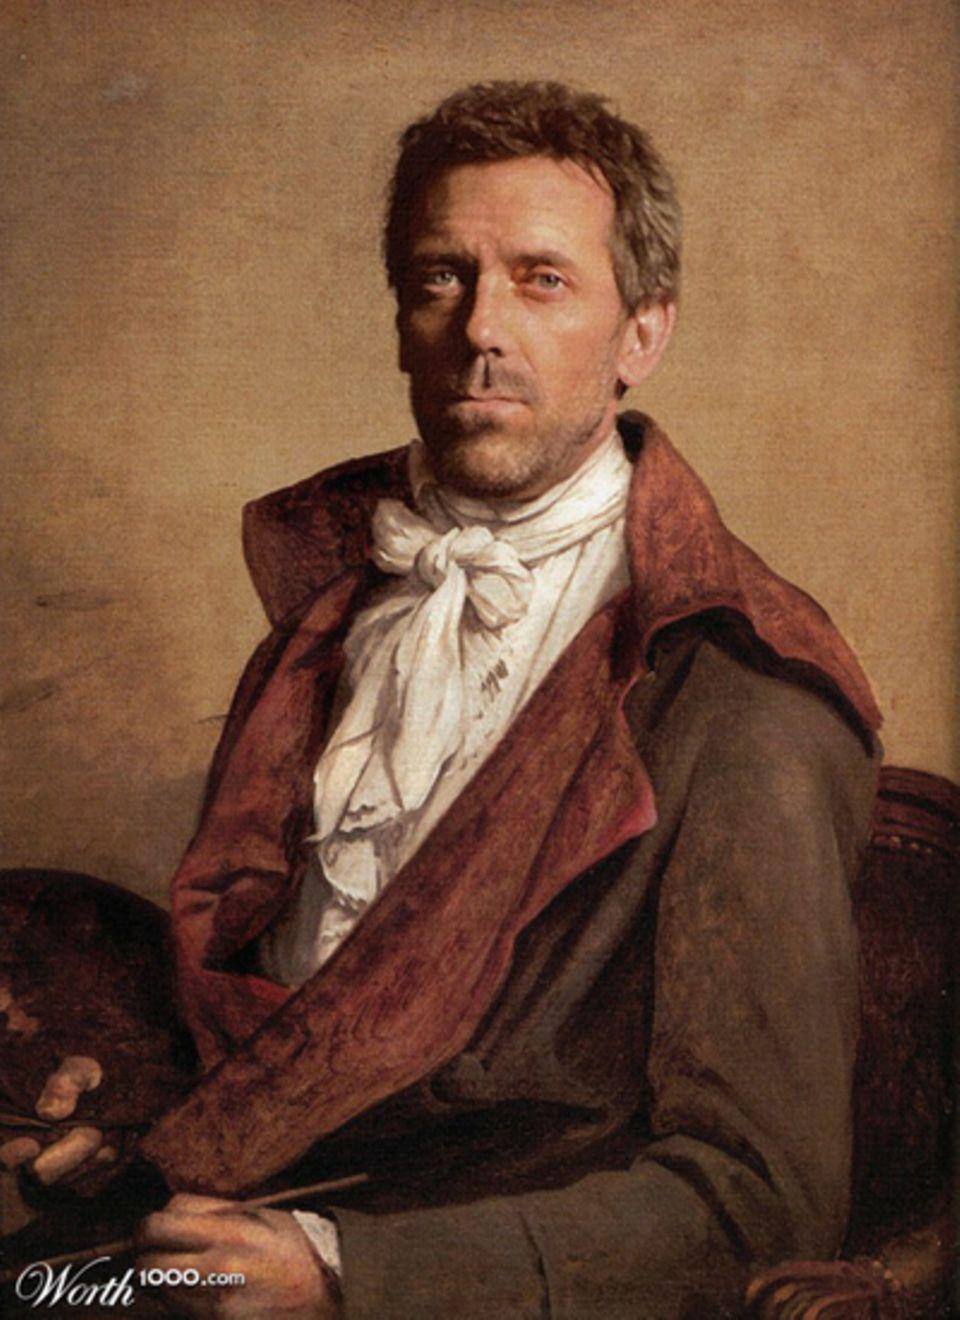 Hugh Laurie als Ölgemälde.